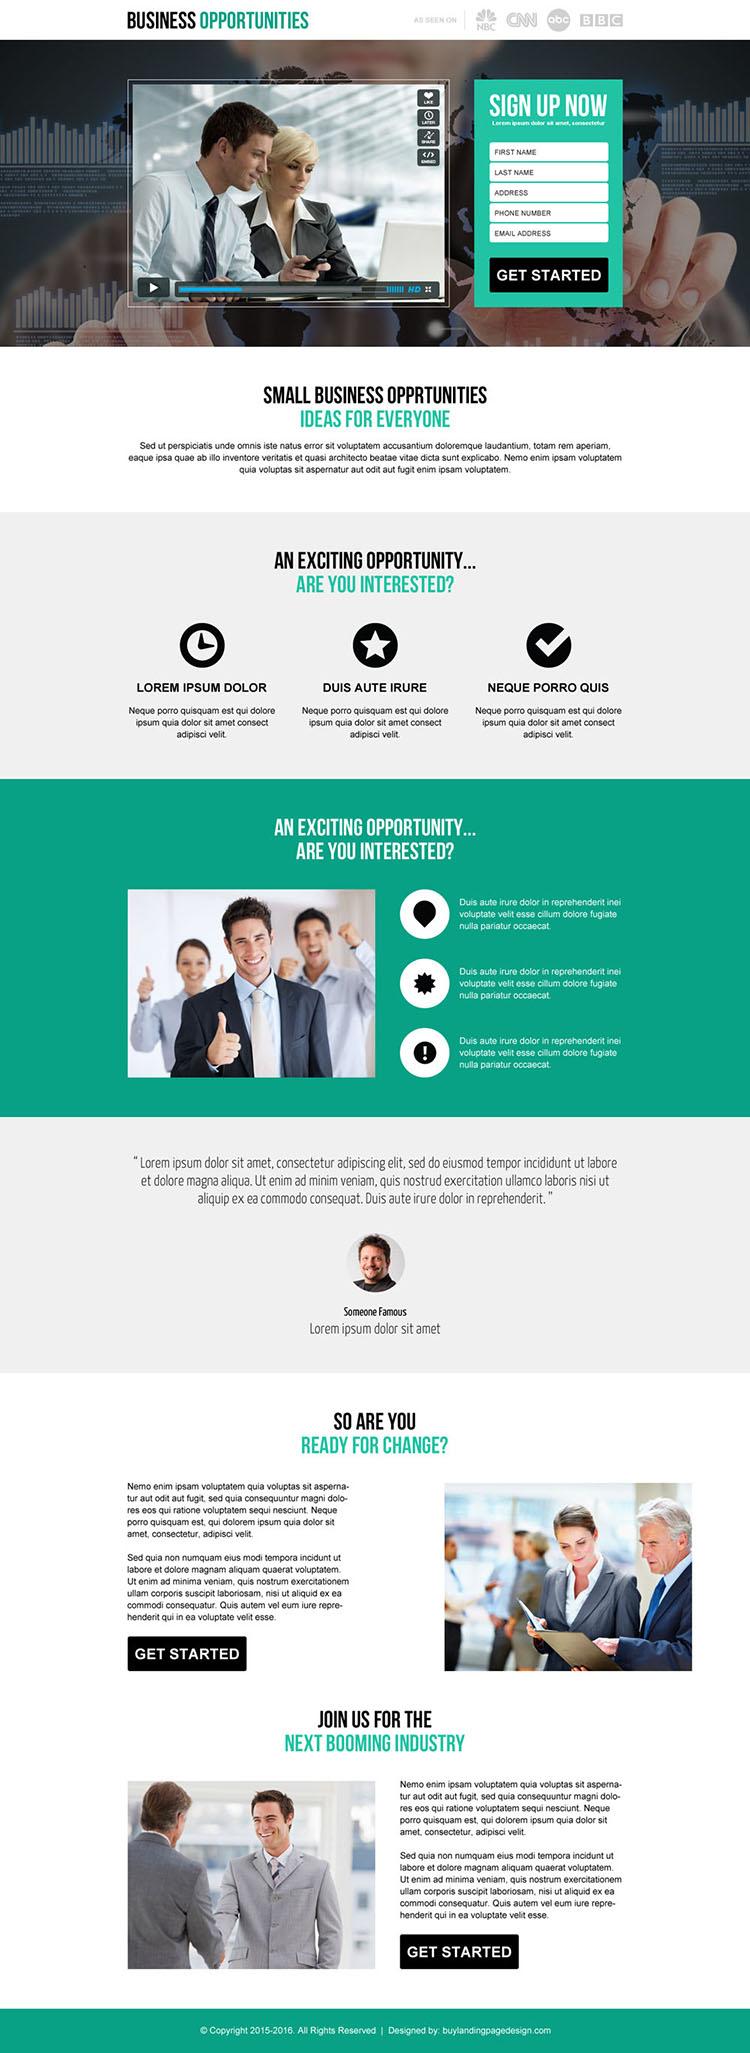 small business idea lead generation video landing page design